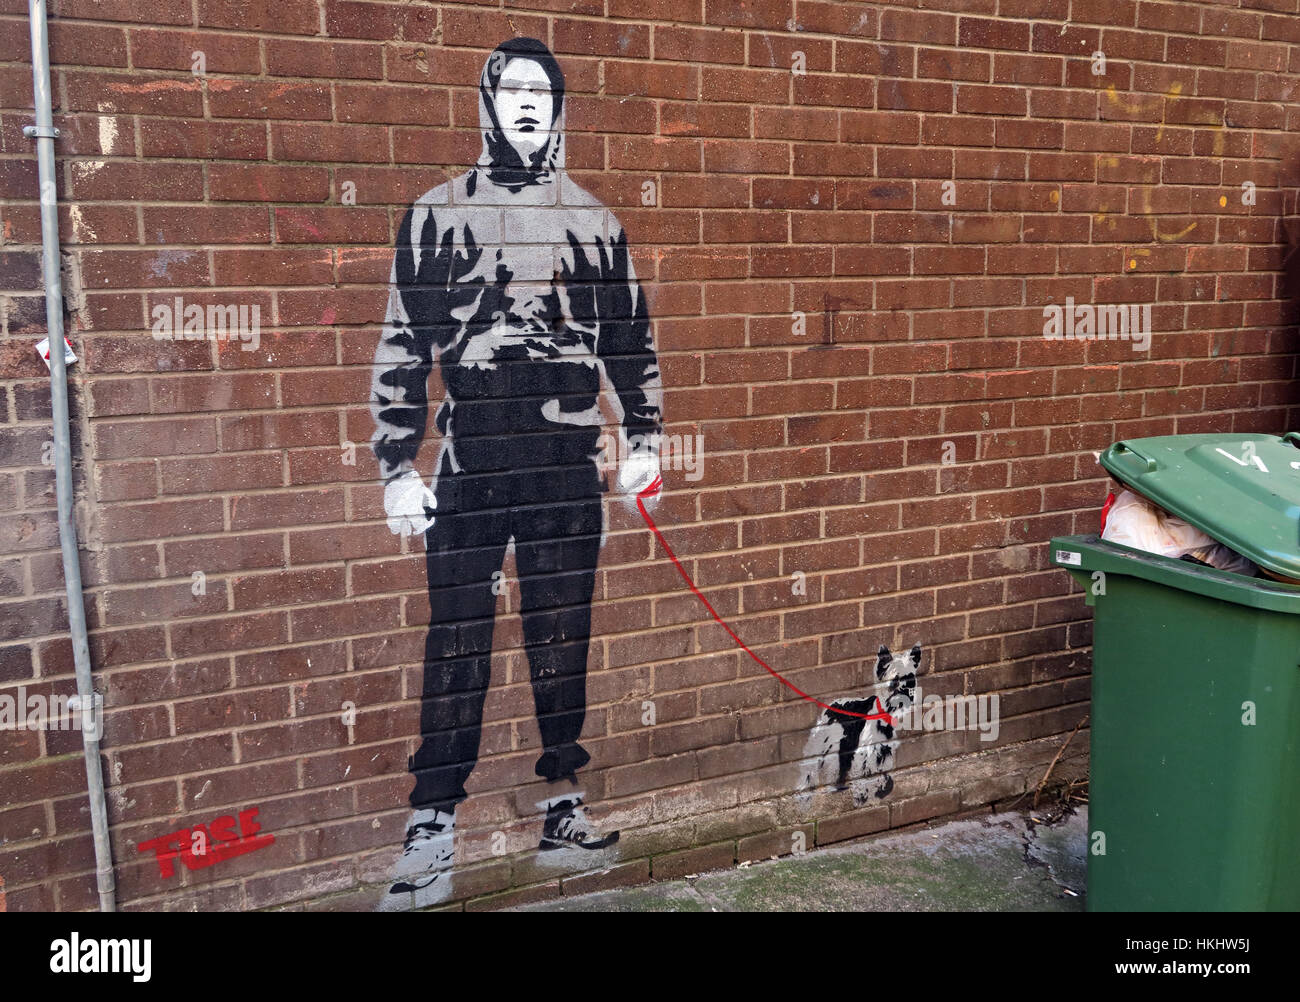 style,Glasgow Queen St,Scotland,gotonysmith,graffiti,grafitti,art,vandelism,Banksy Style